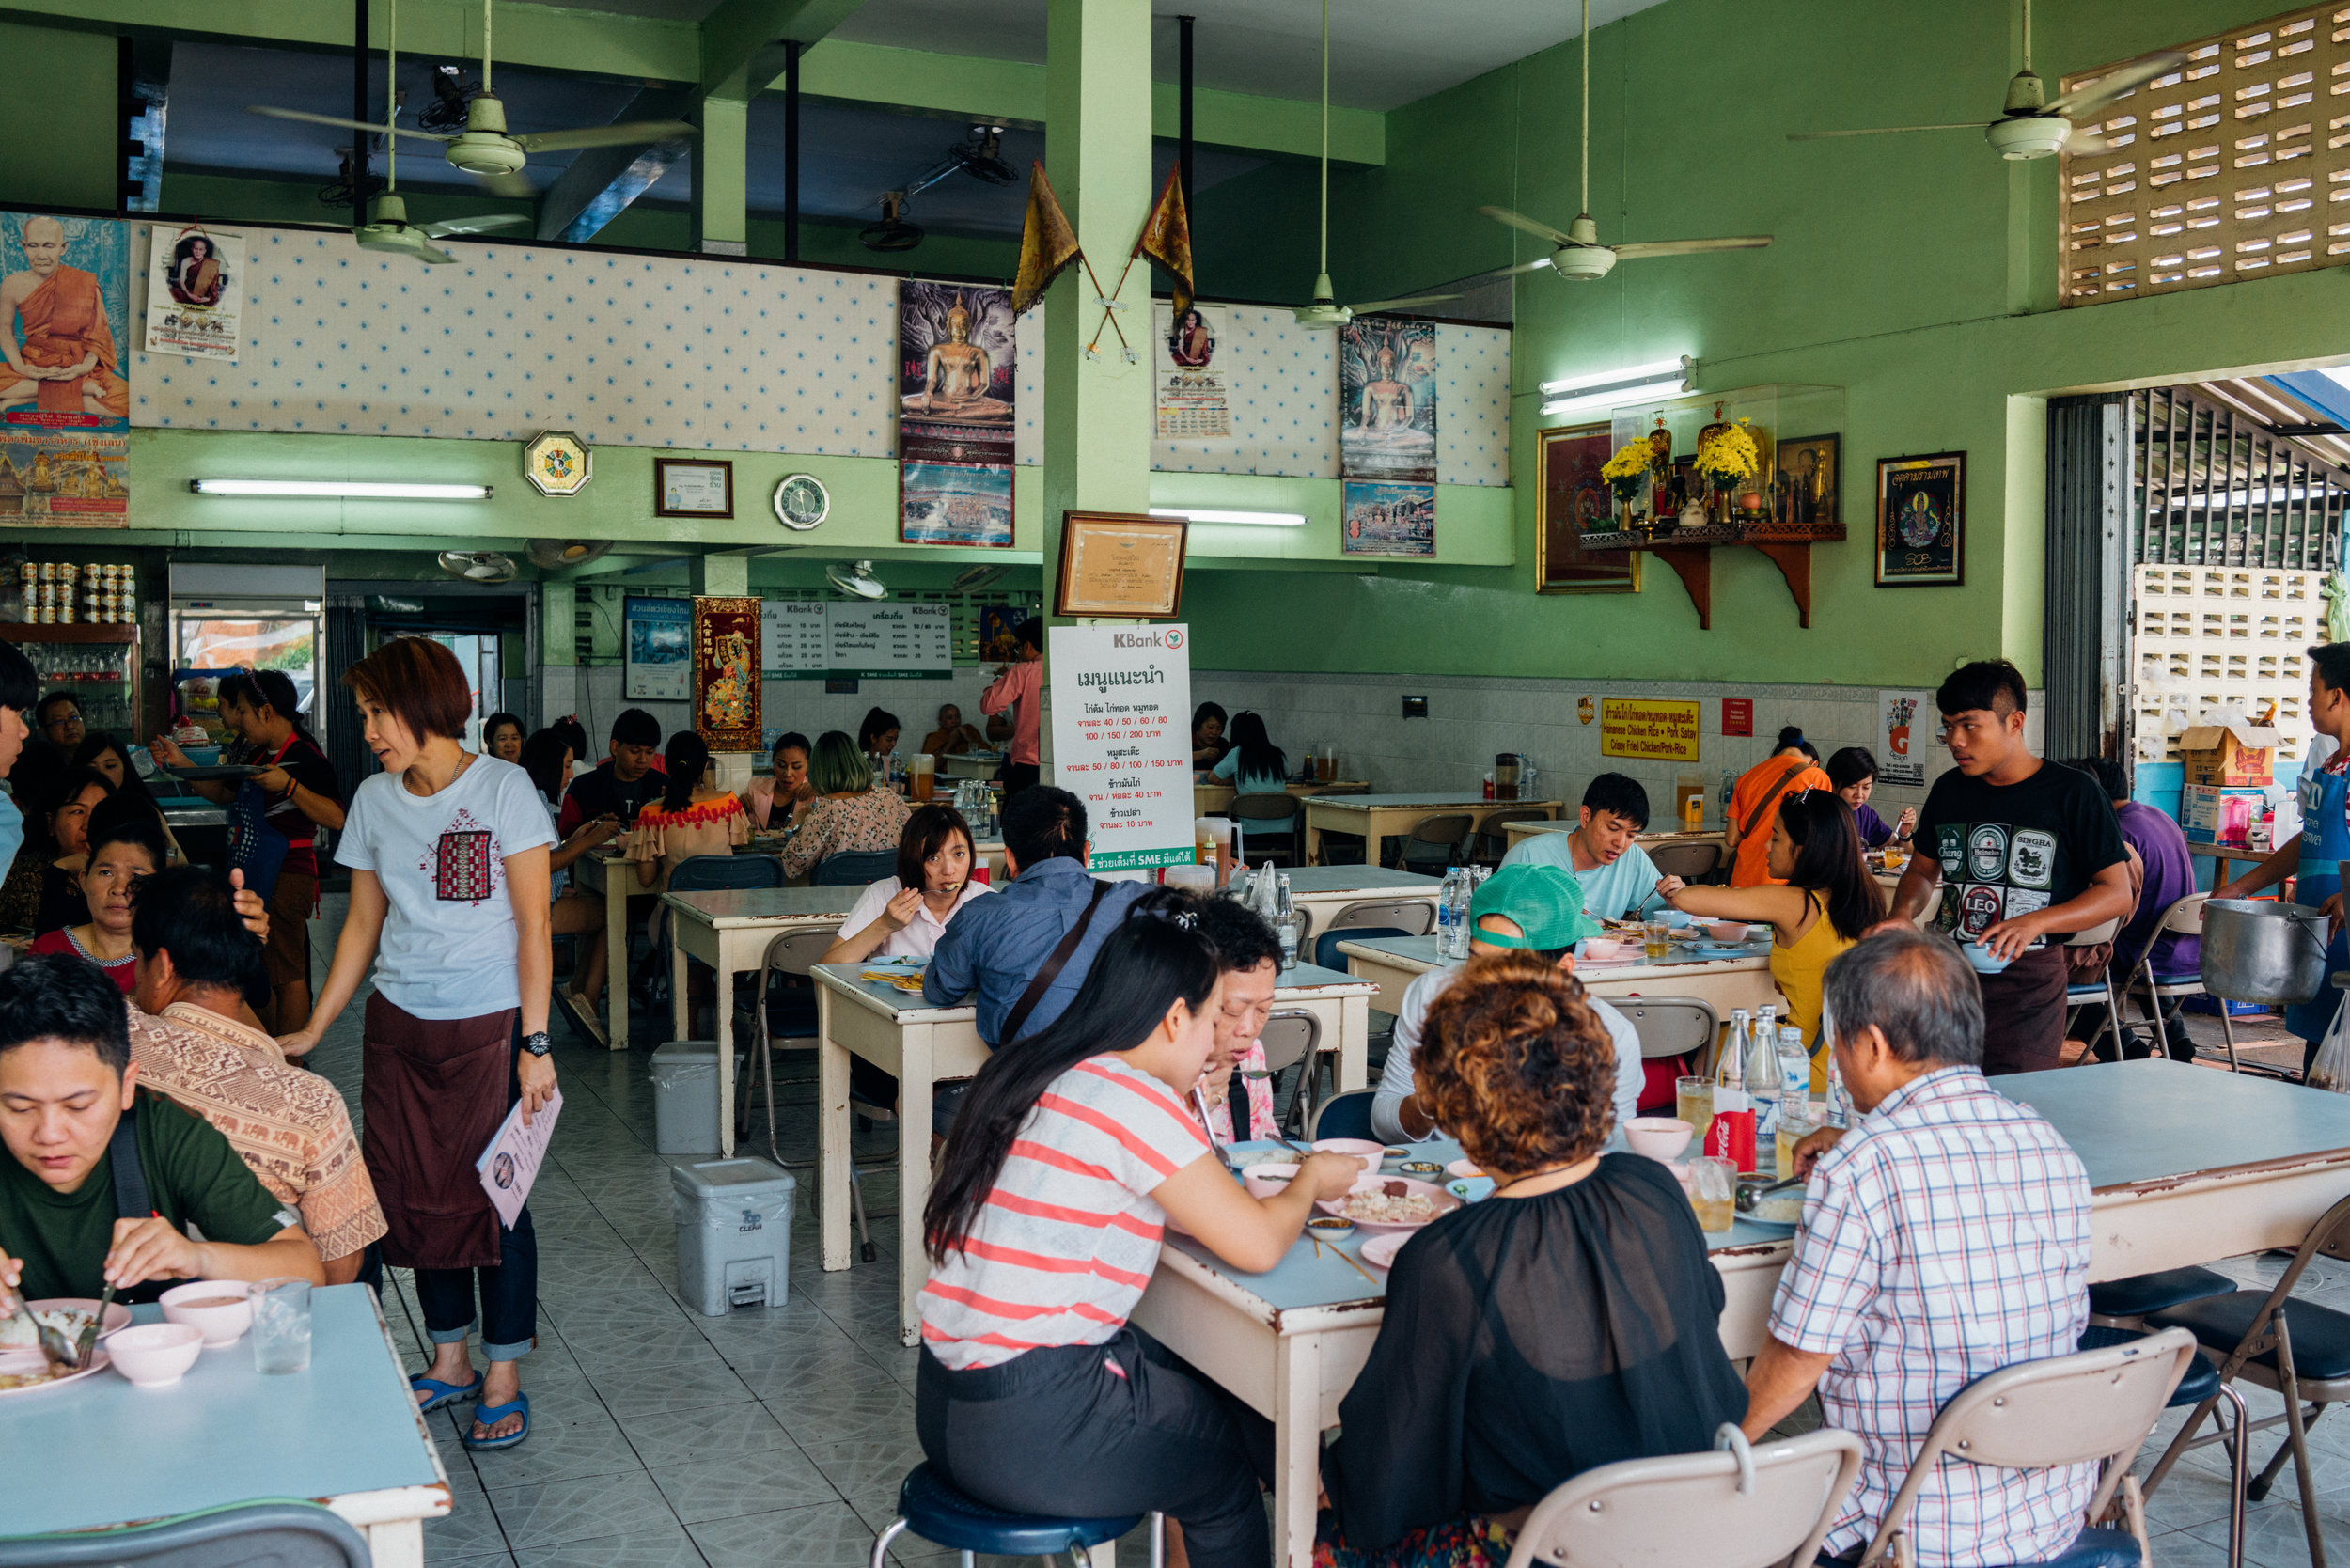 Lunch hour at Kiat Ocha